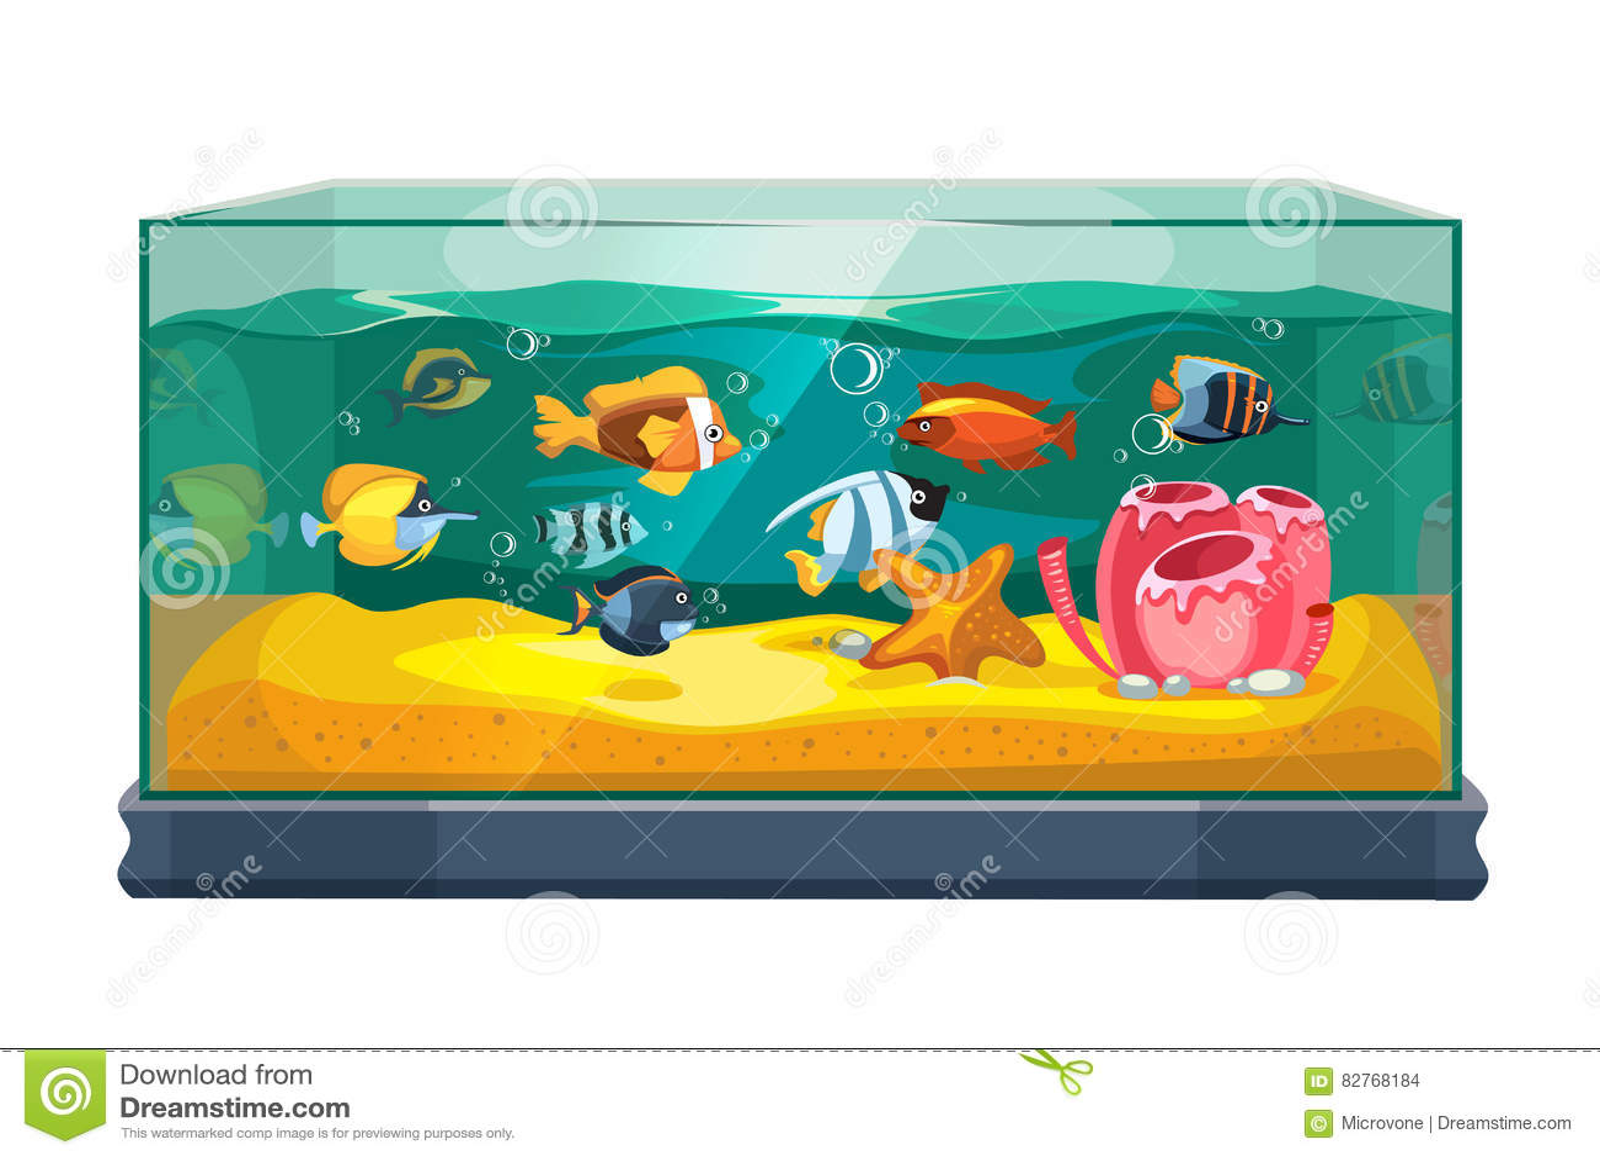 Cartoon Freshwater Fishes In Tank Aquarium Vector Illustration Stock